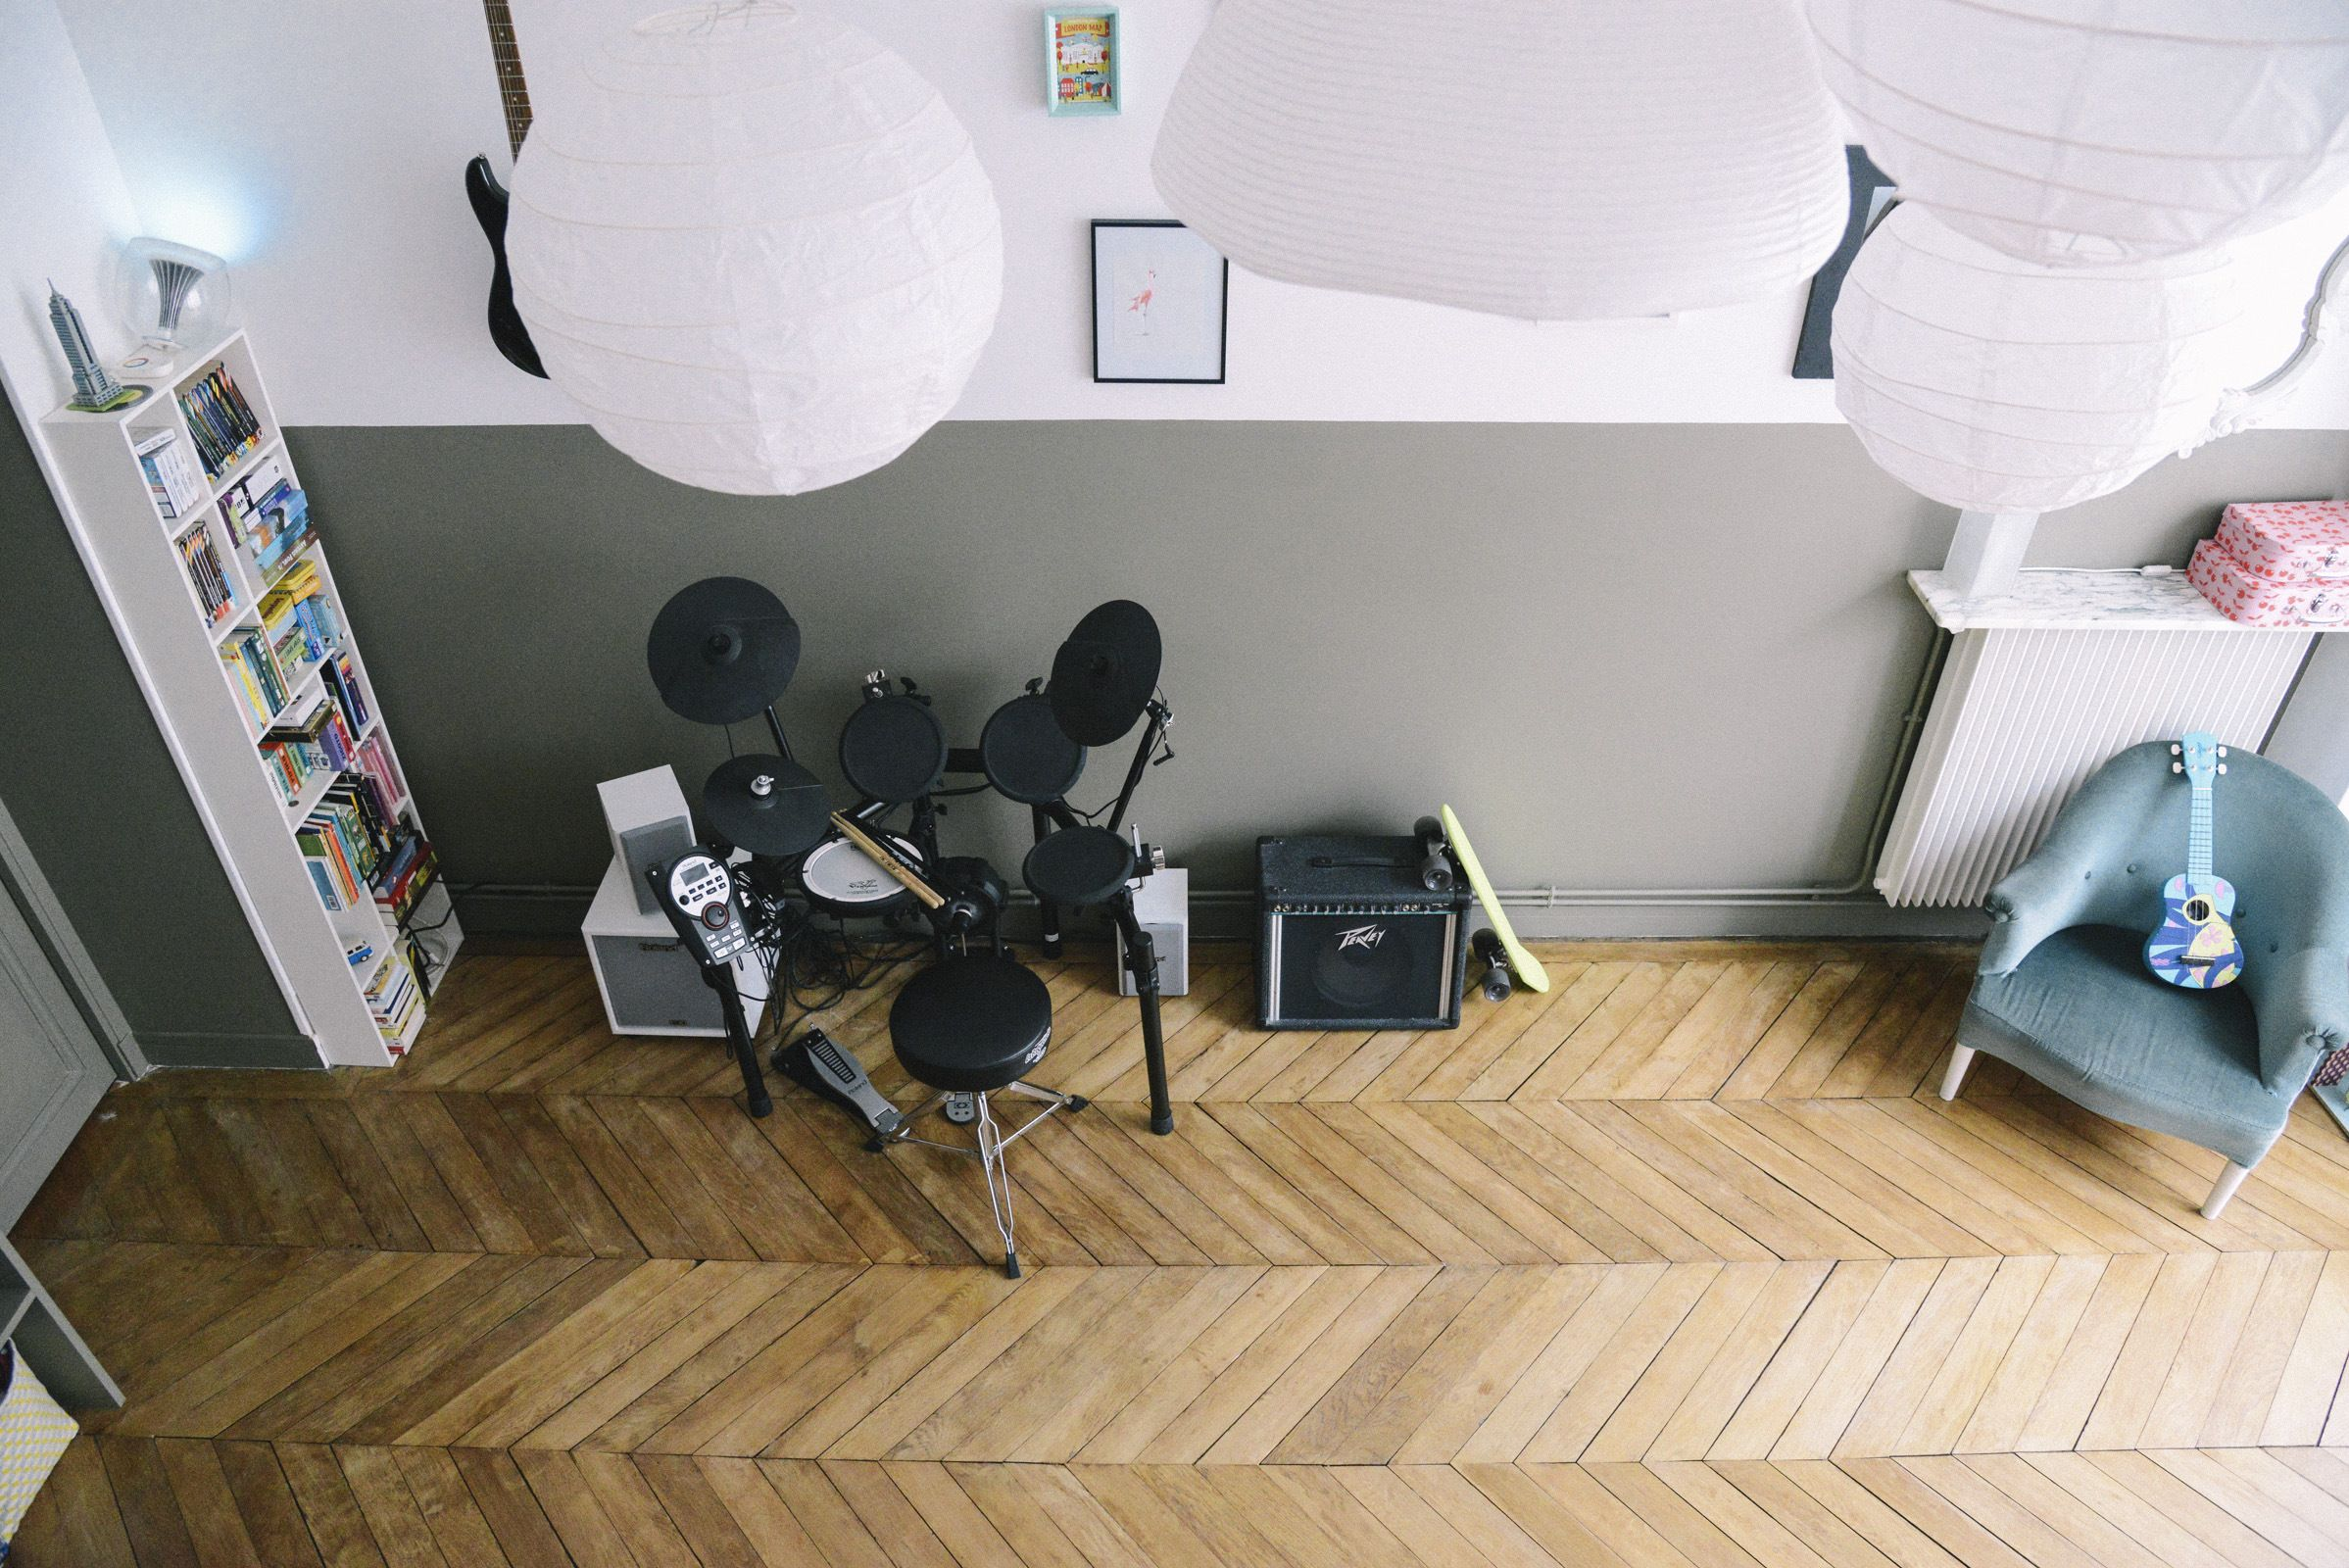 Décoration chambre ado - Rock, musique, kaki  Déco chambre ado